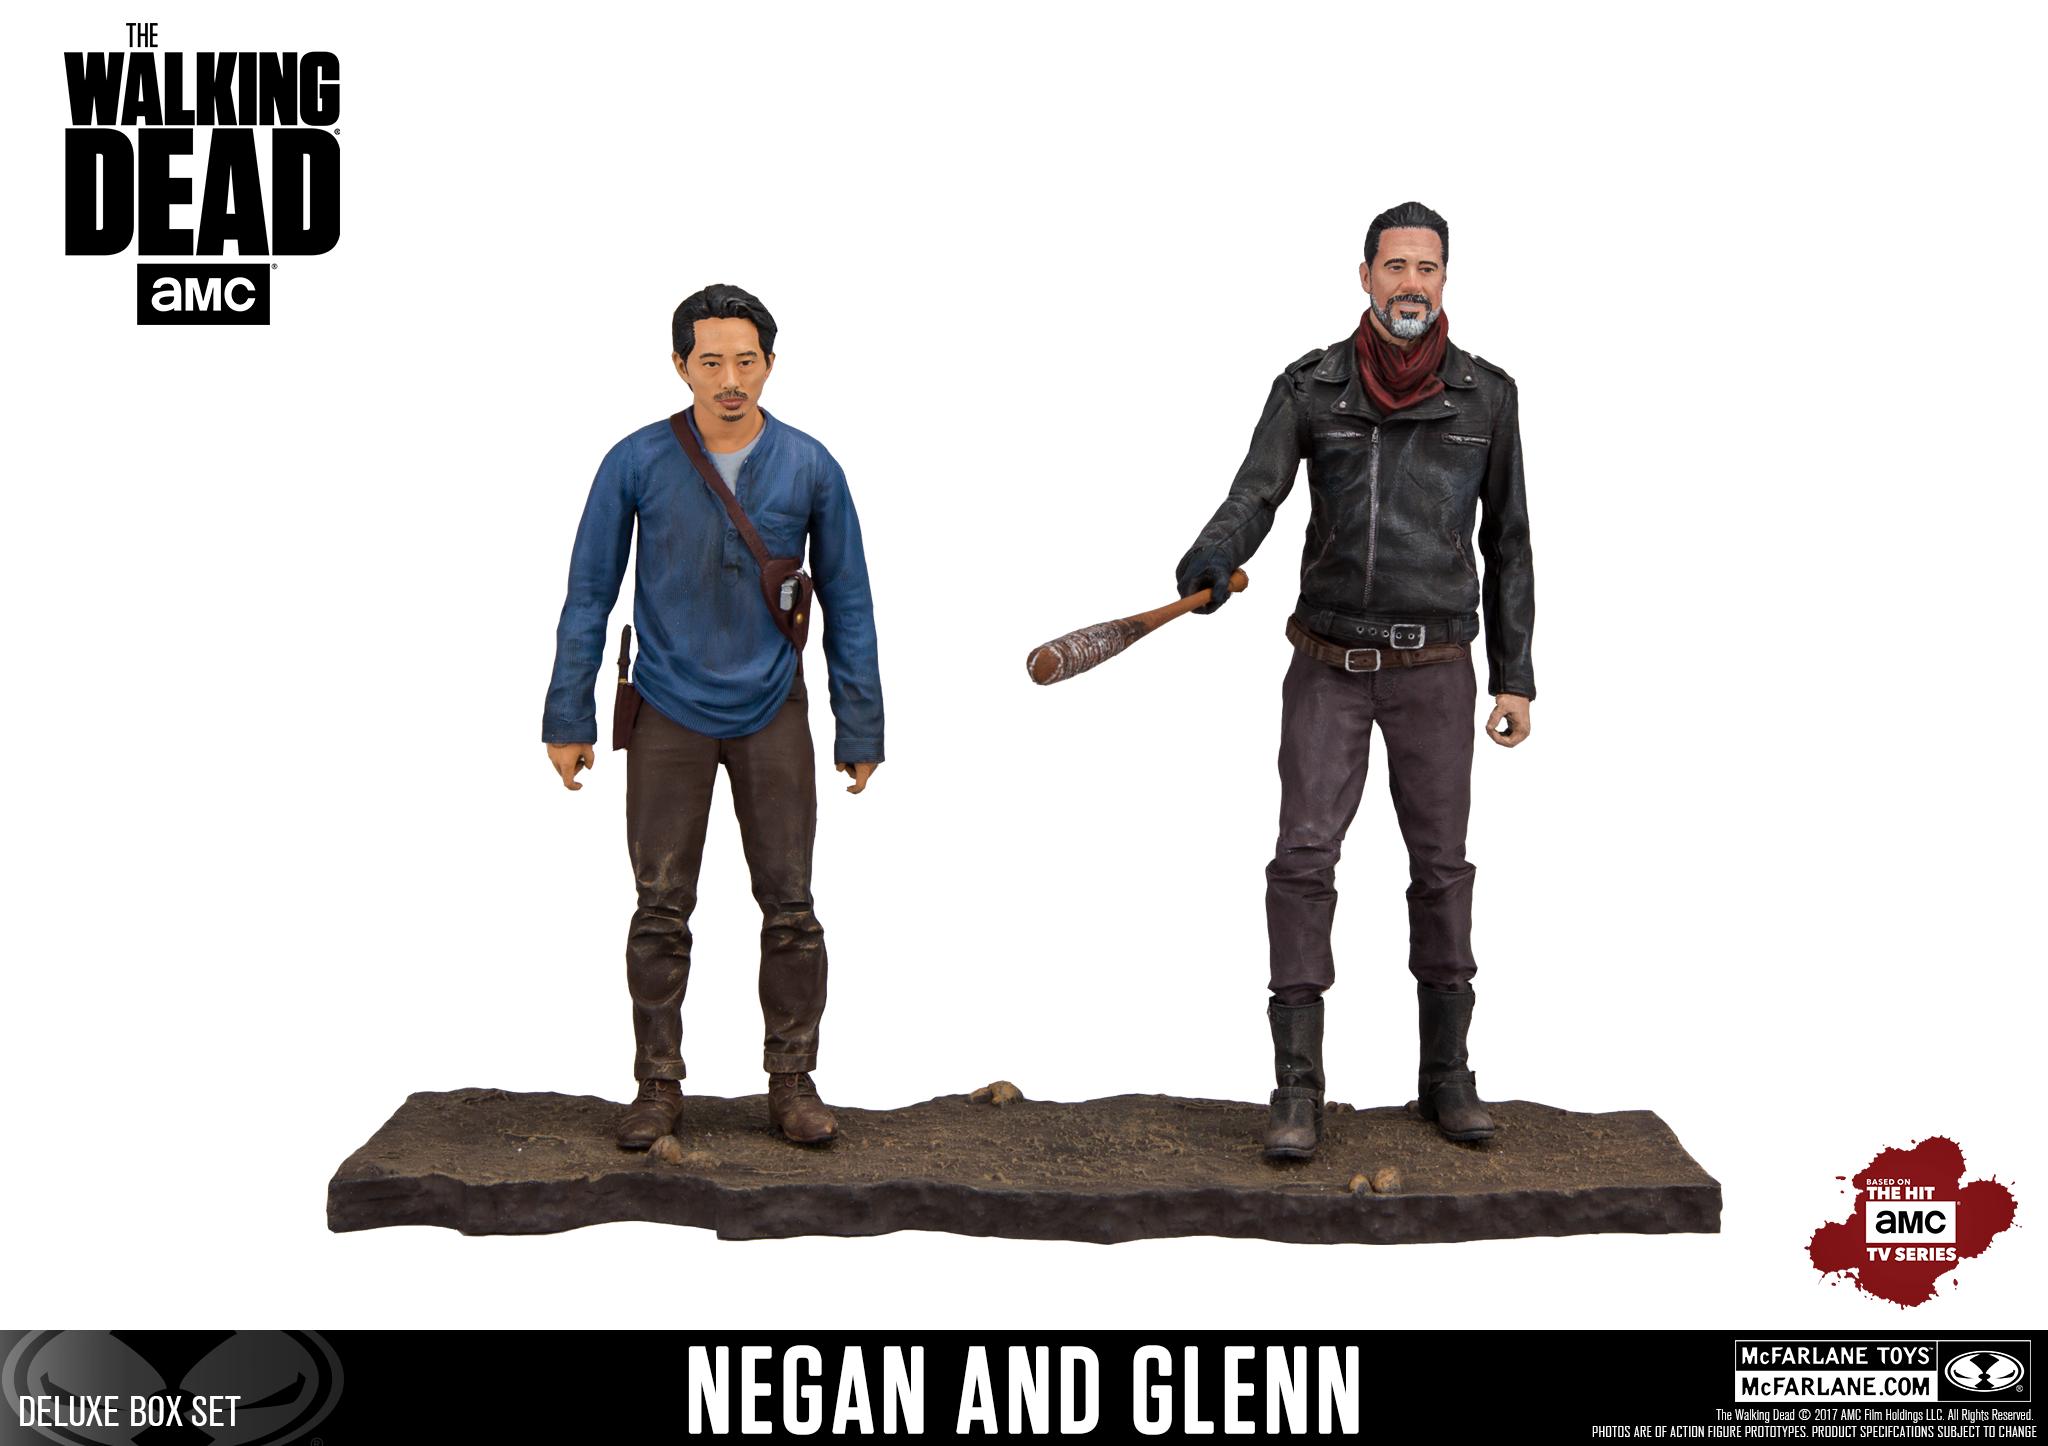 Negan and Glenn slugged